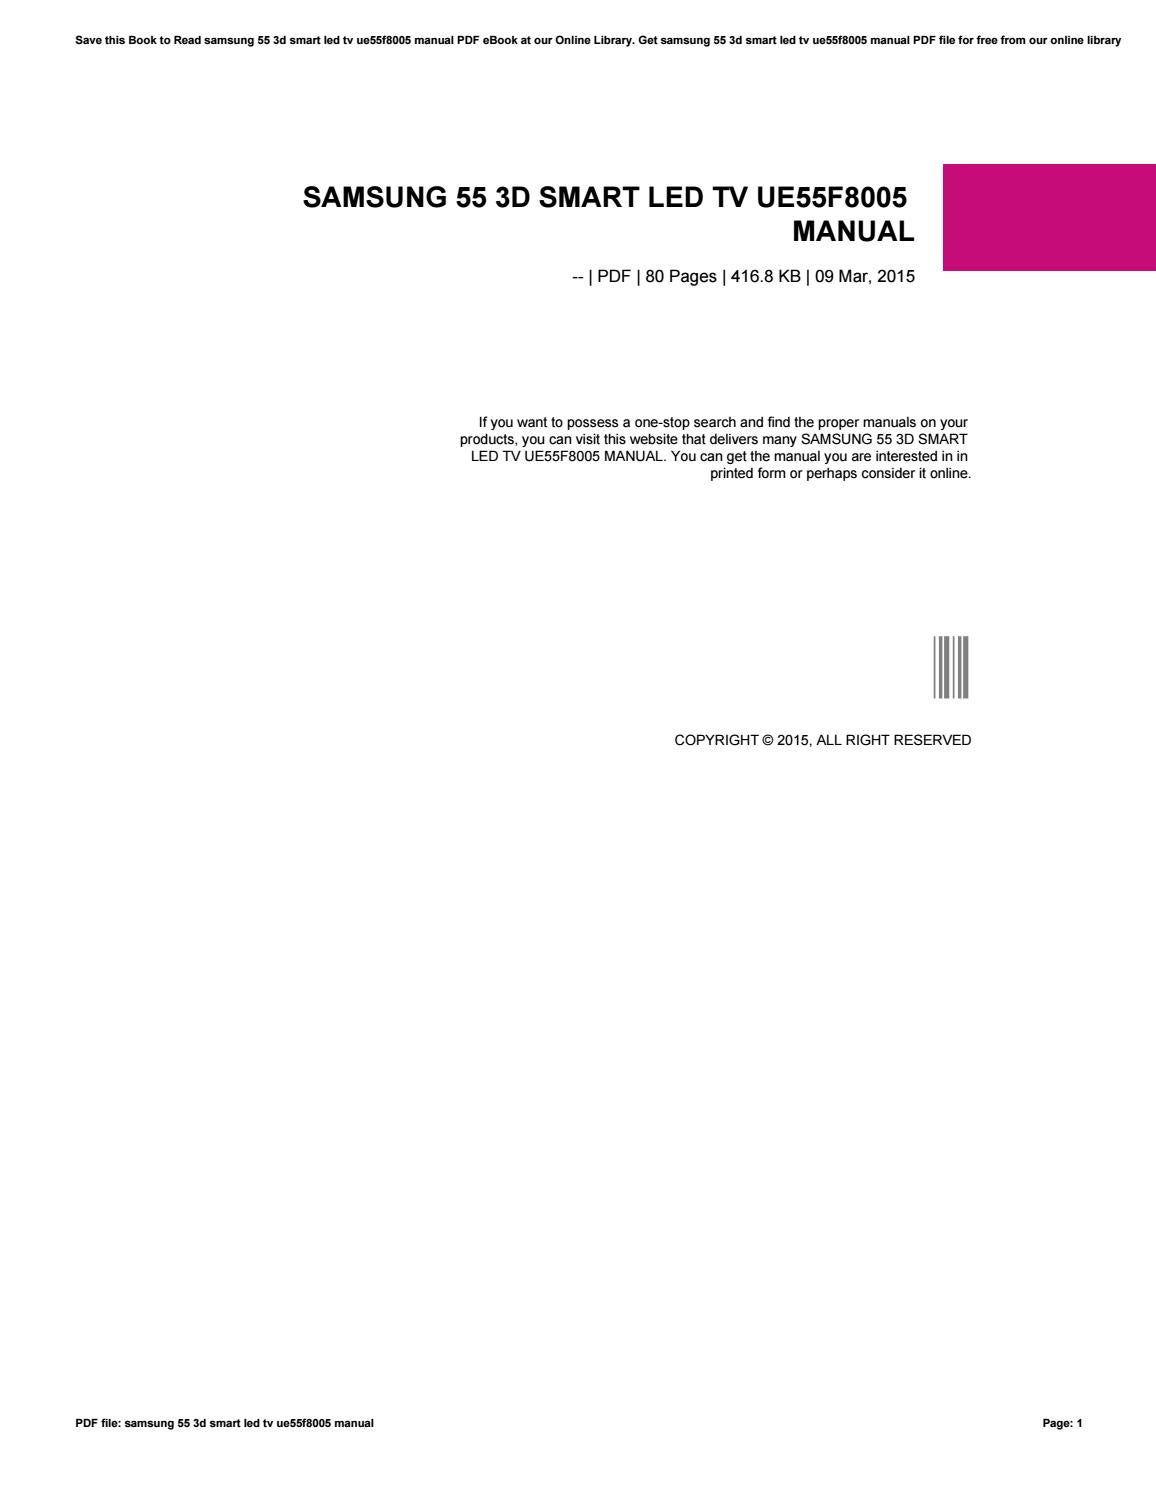 Smart Materials Textbook Pdf File